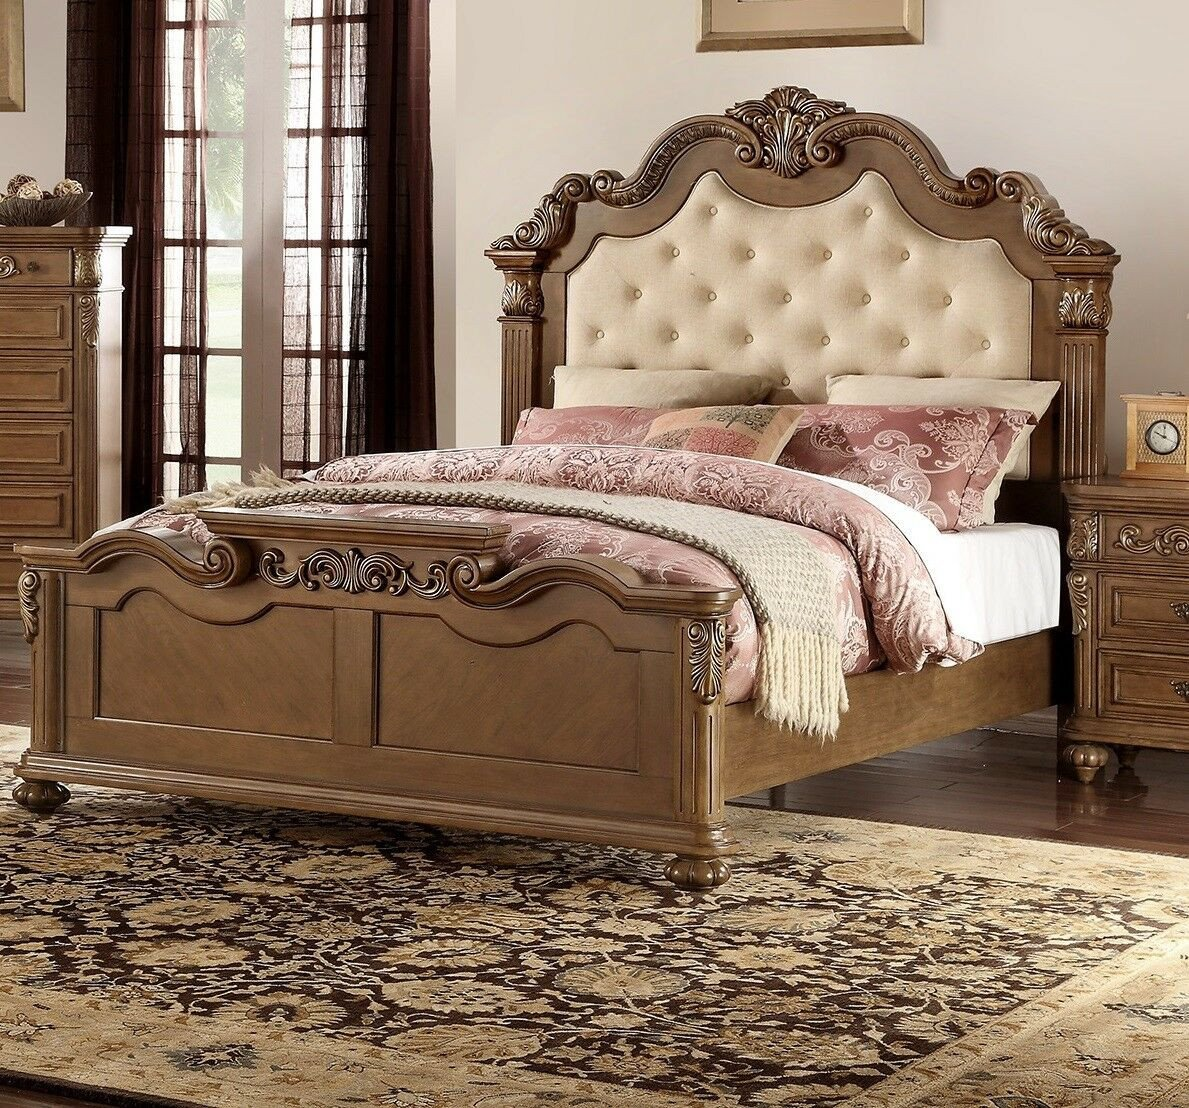 Tufted King Bedroom Set Elegant Bedroom Furniture 1pc Cal King Size Bed Medium Brown Tufted Hb Faux Leather